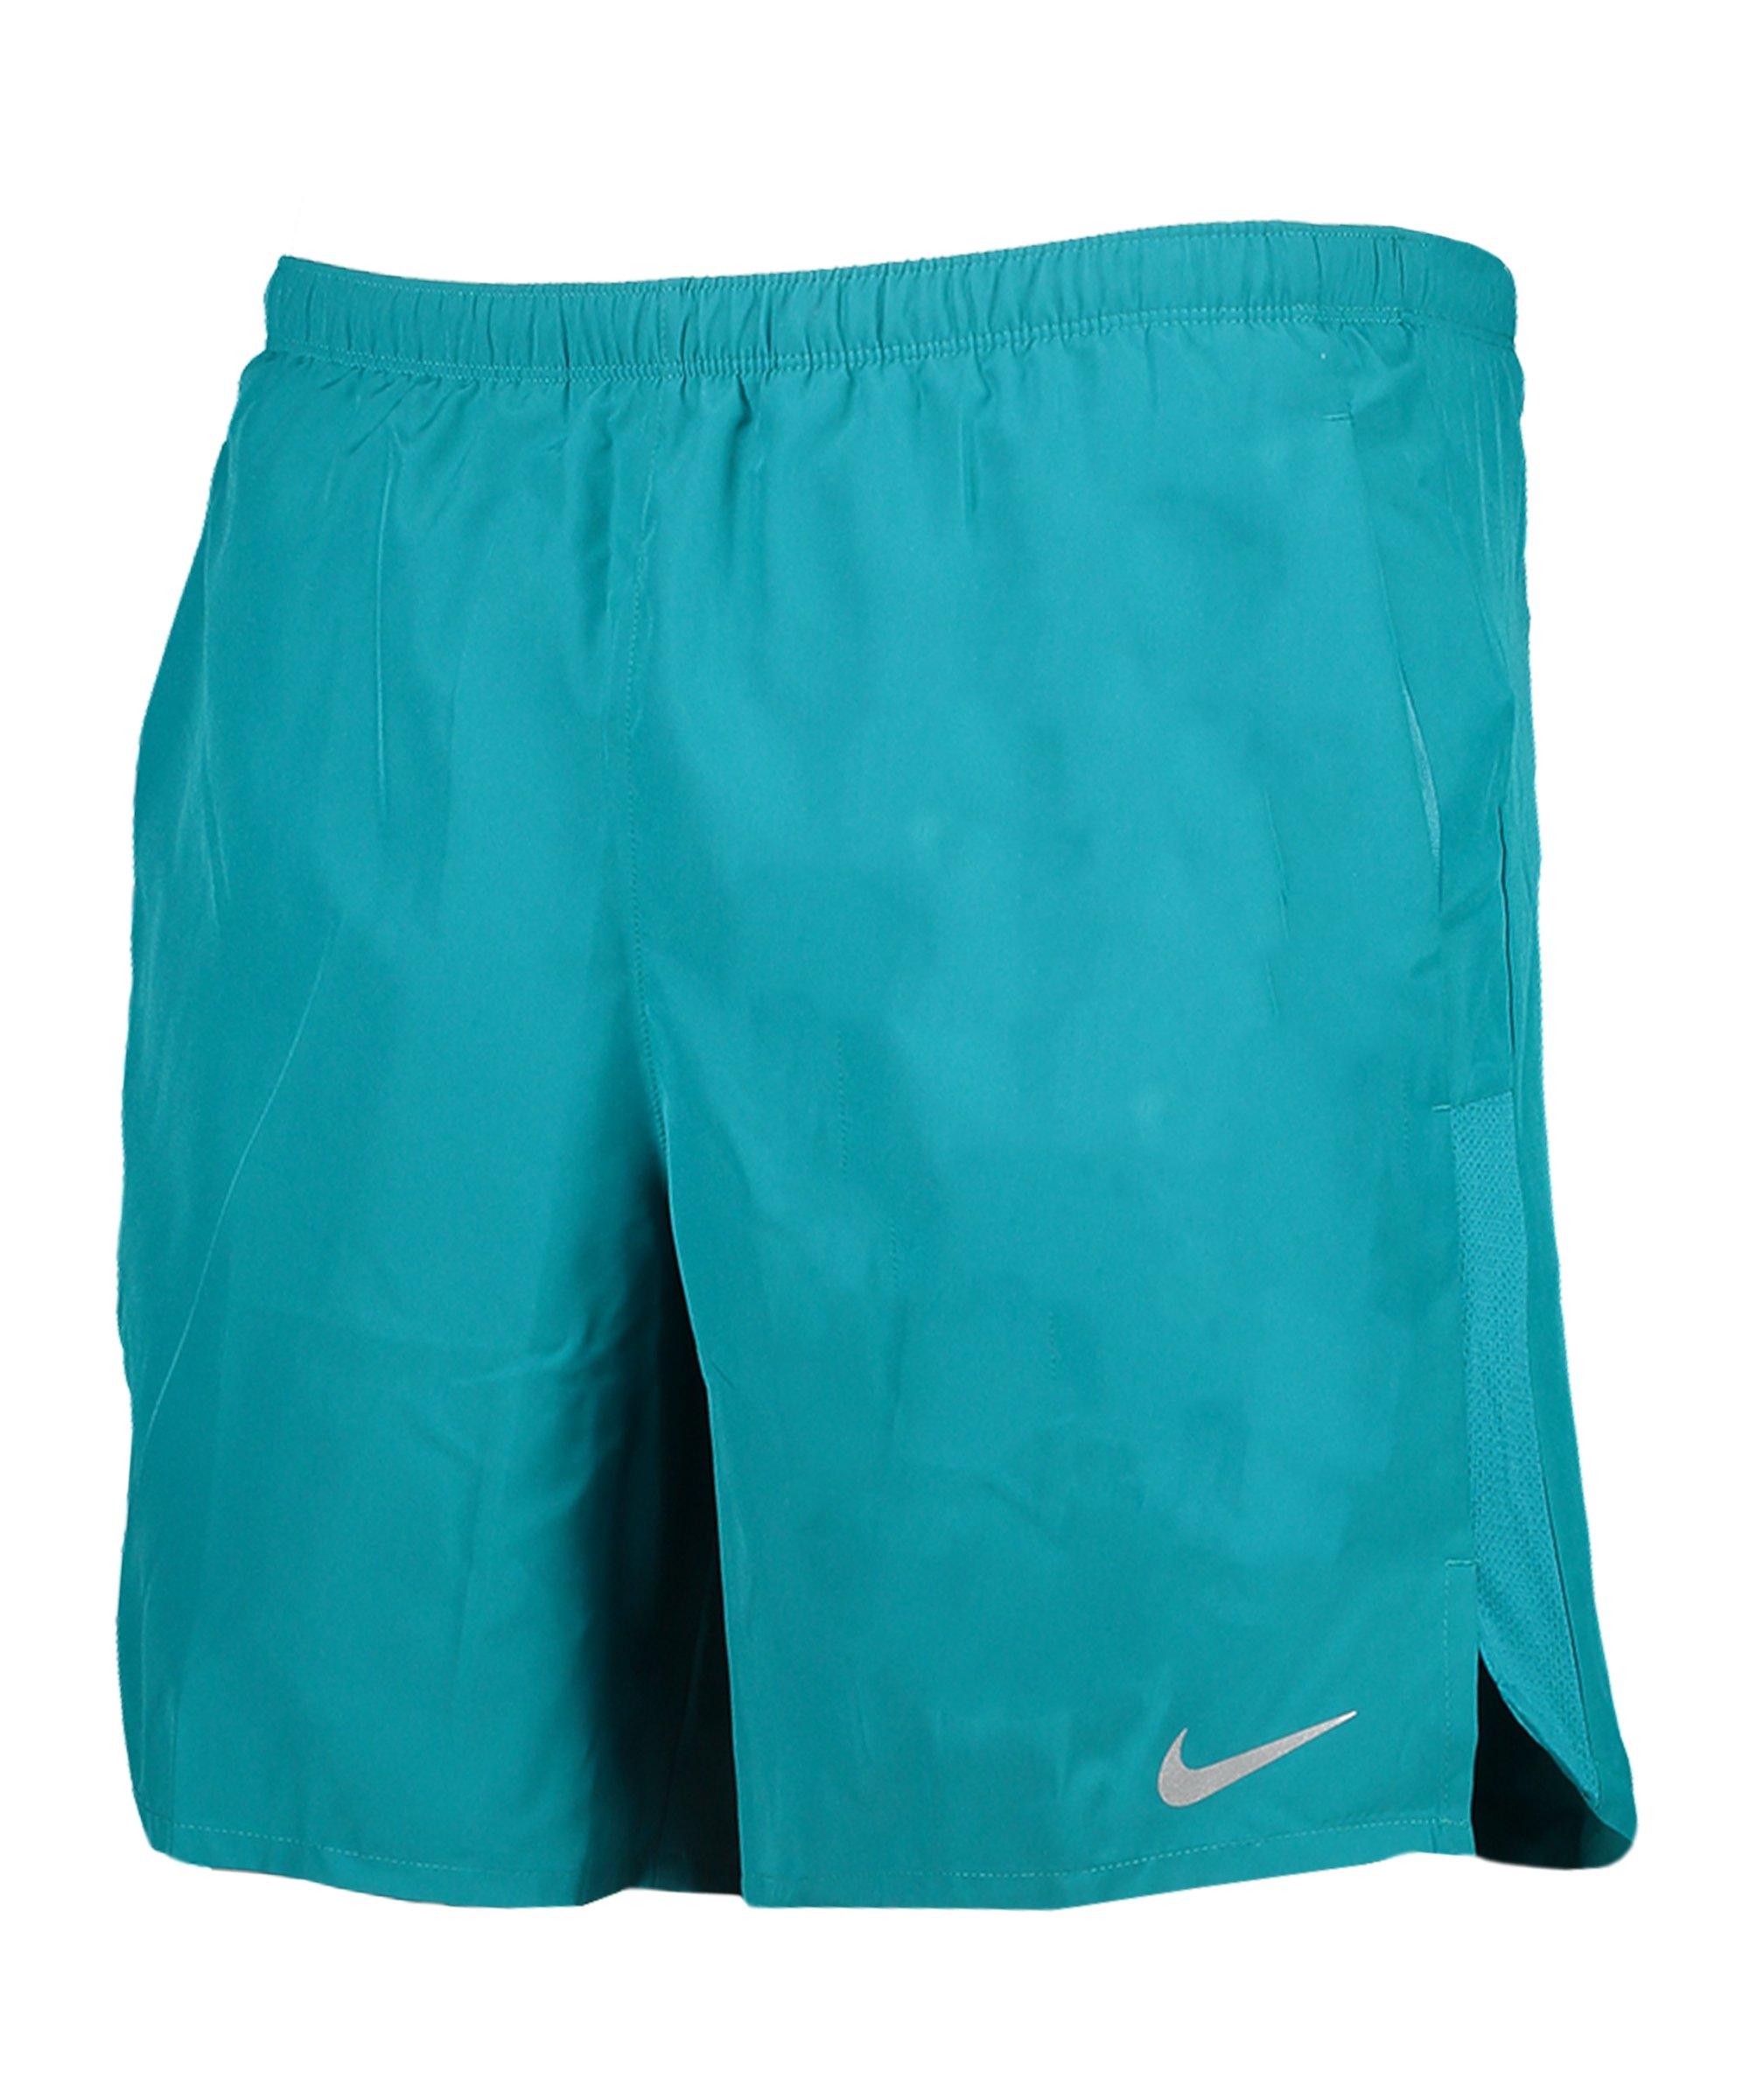 Nike Challenger 7 2in1 Short Running Blau F467 - blau